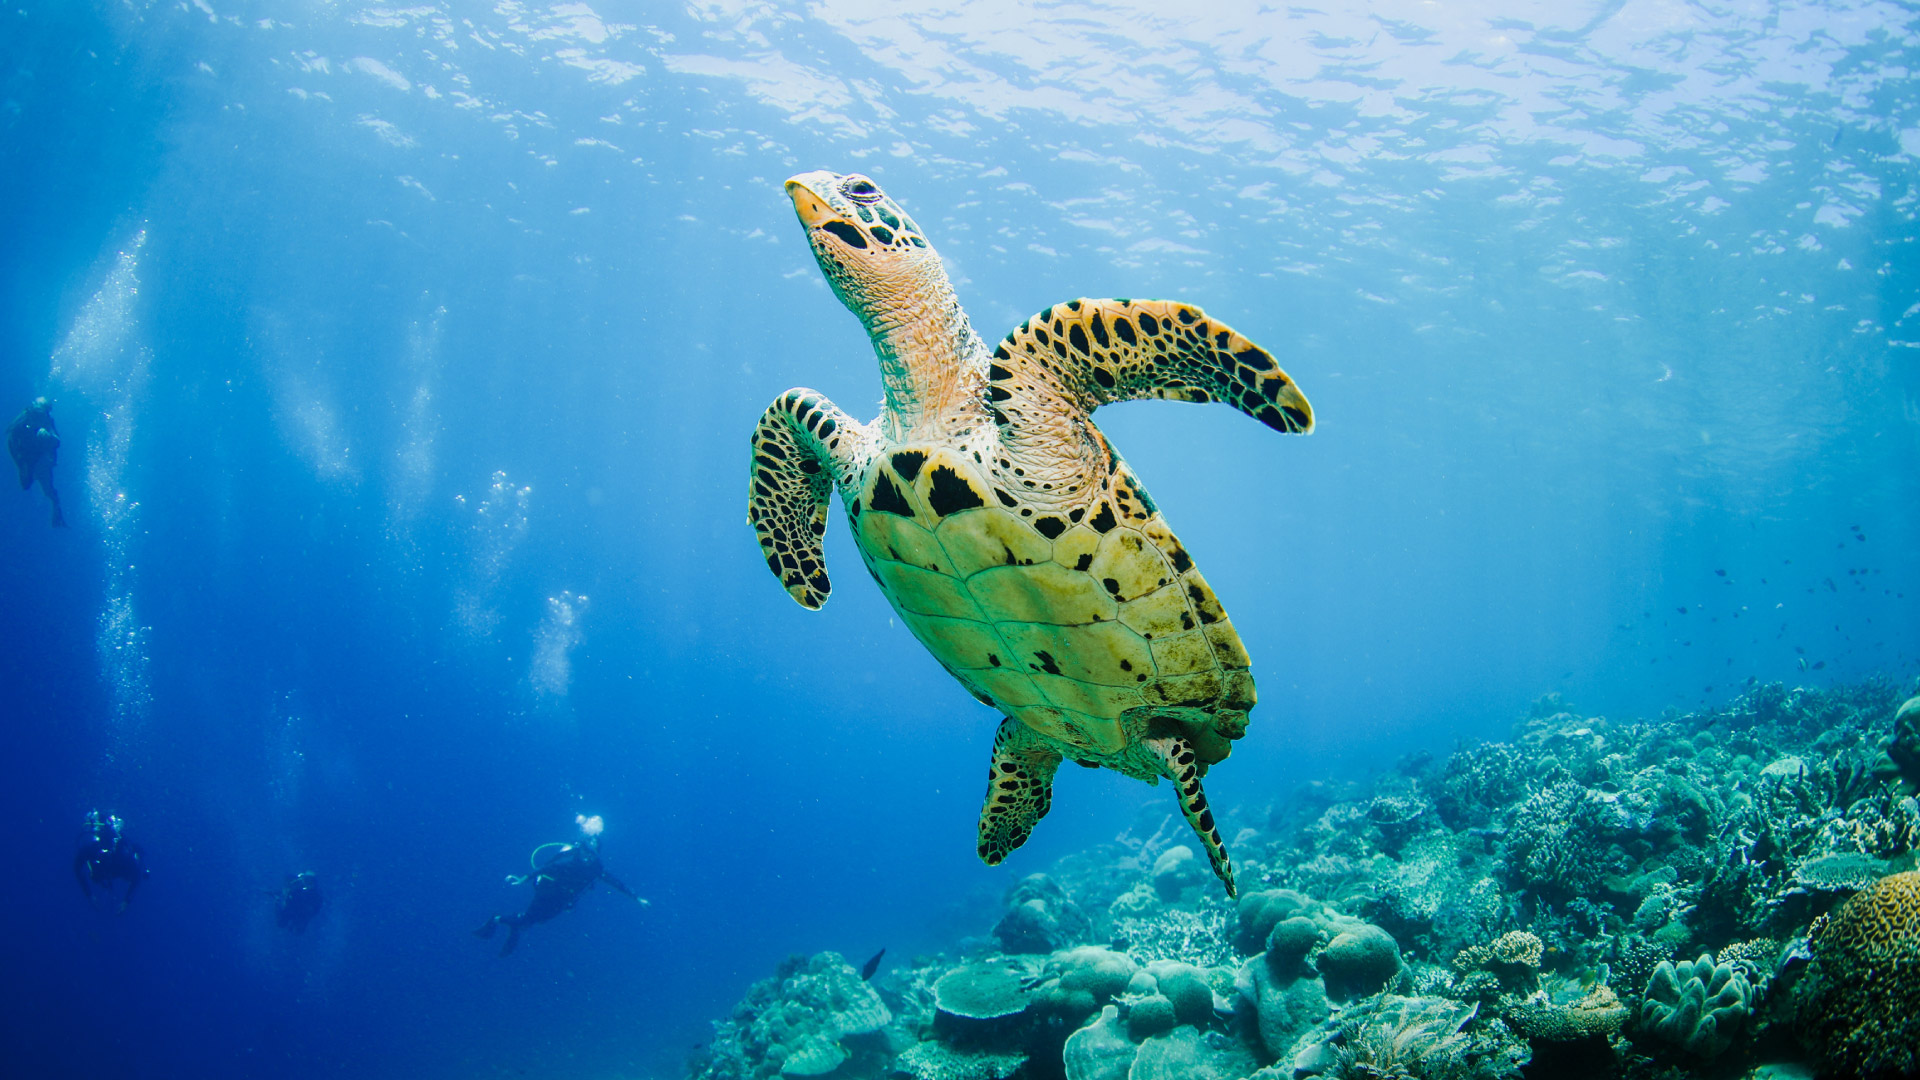 Flying Sea Turtle